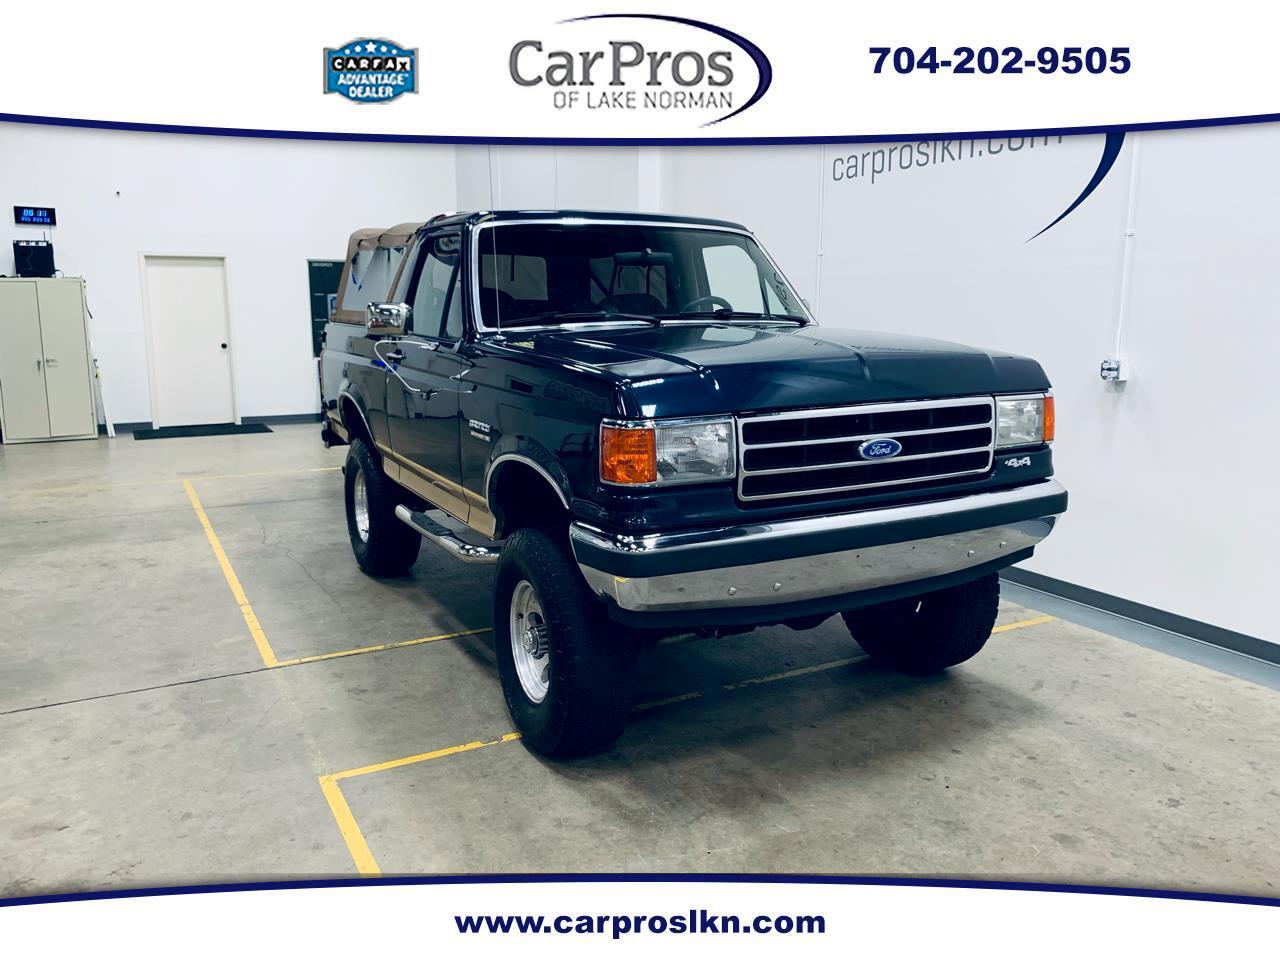 Ford Bronco 2dr Wagon 1989